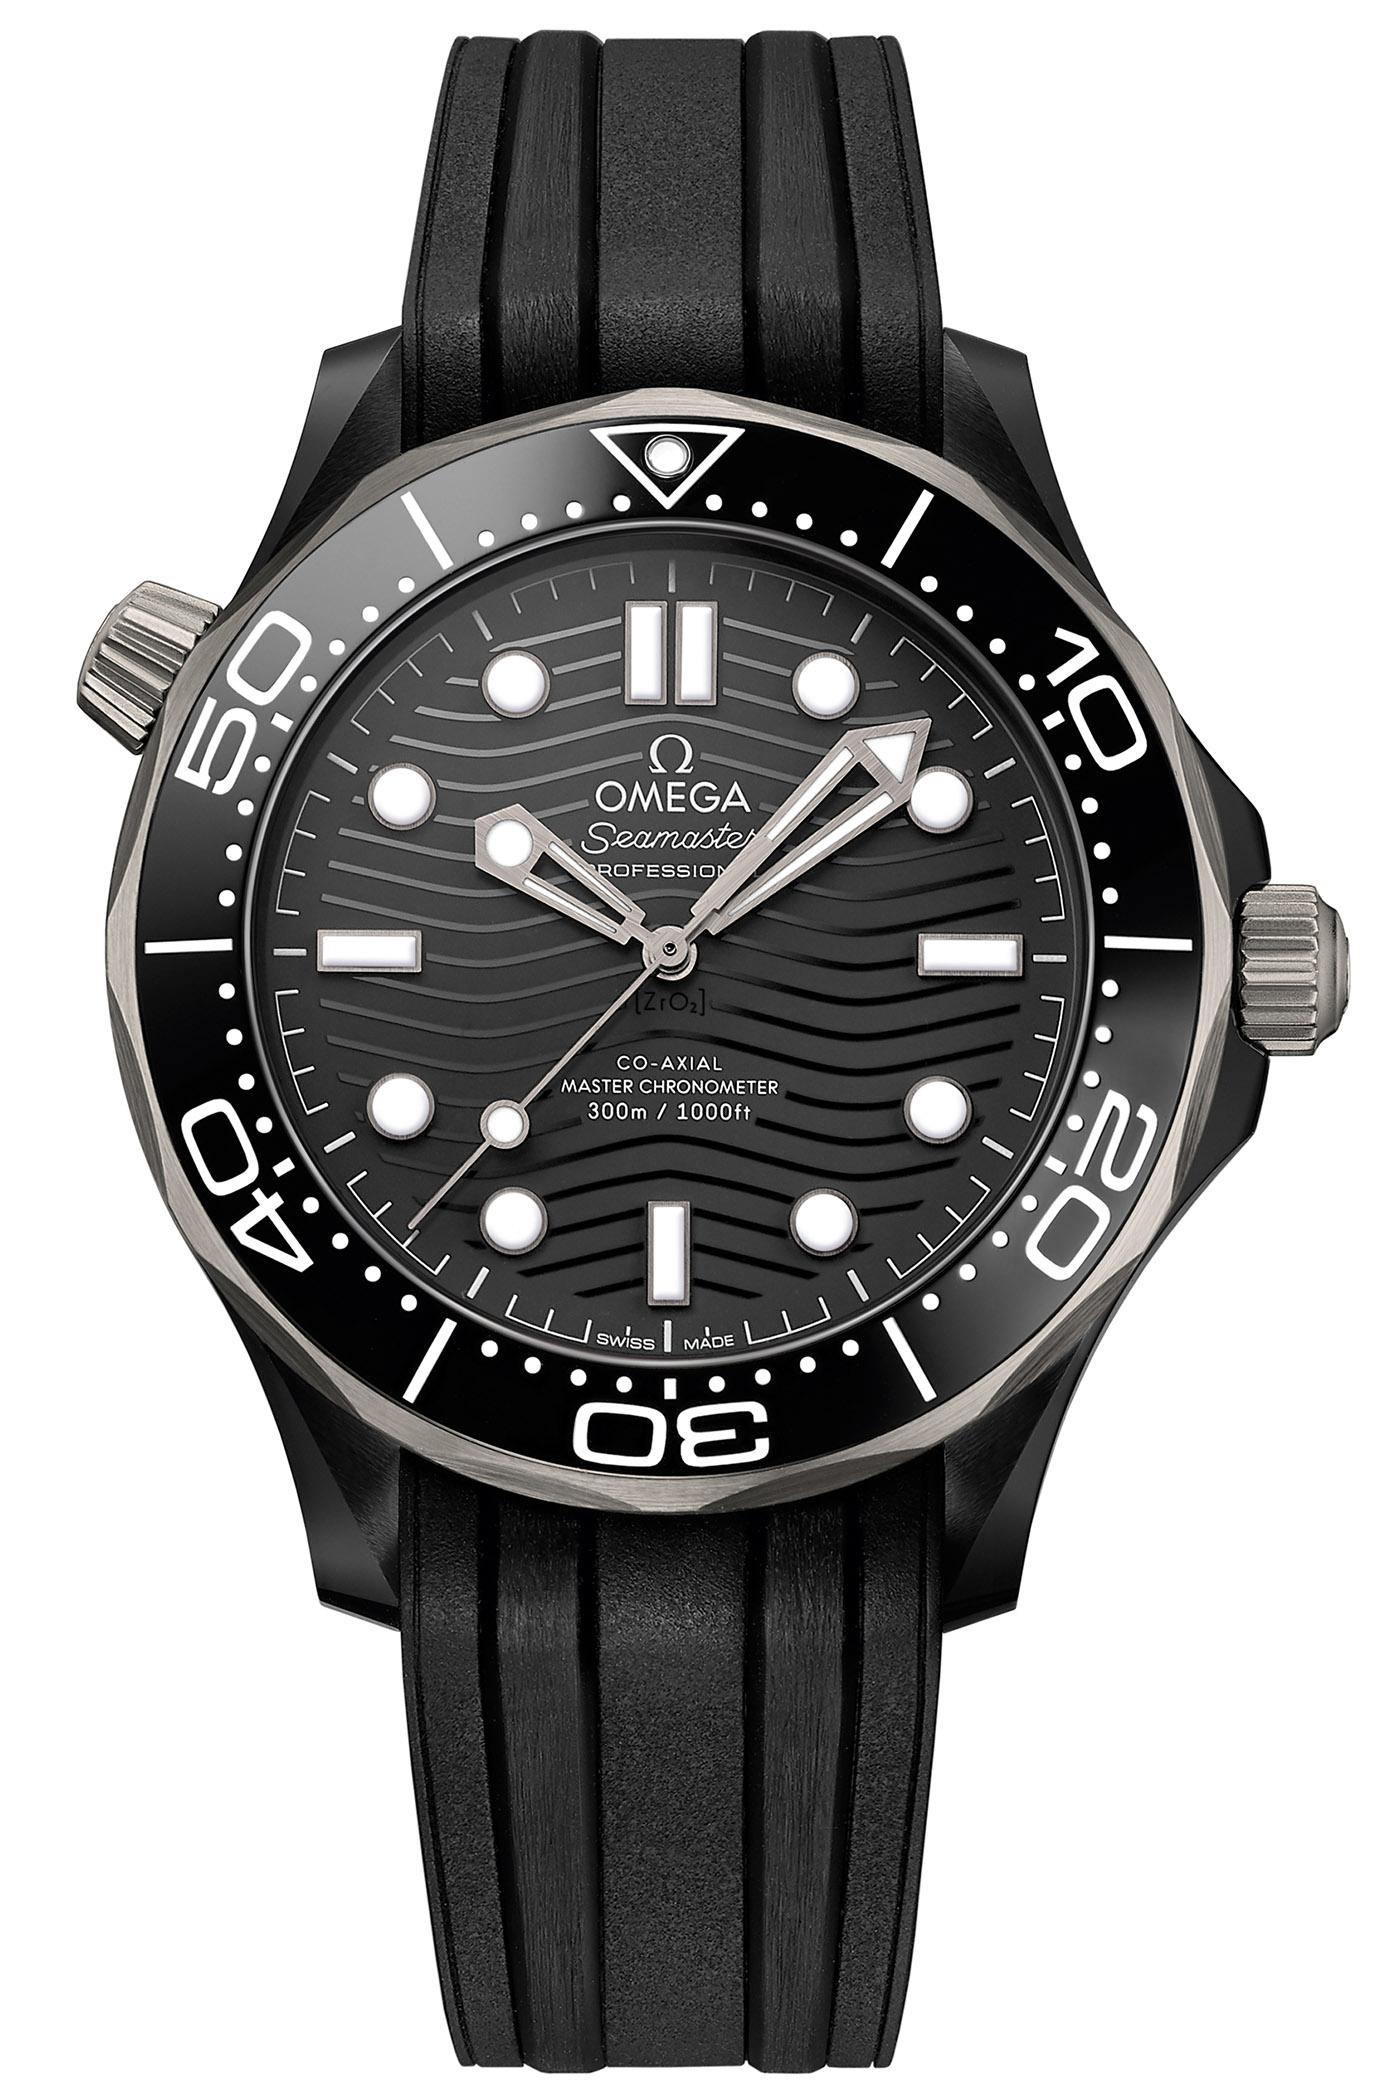 Name:  Omega-Seamaster-Diver-300M-Ceramic-and-Titanium-210.92.44.20.01.001-collection-2019-1.jpg Views: 235 Size:  412.4 KB